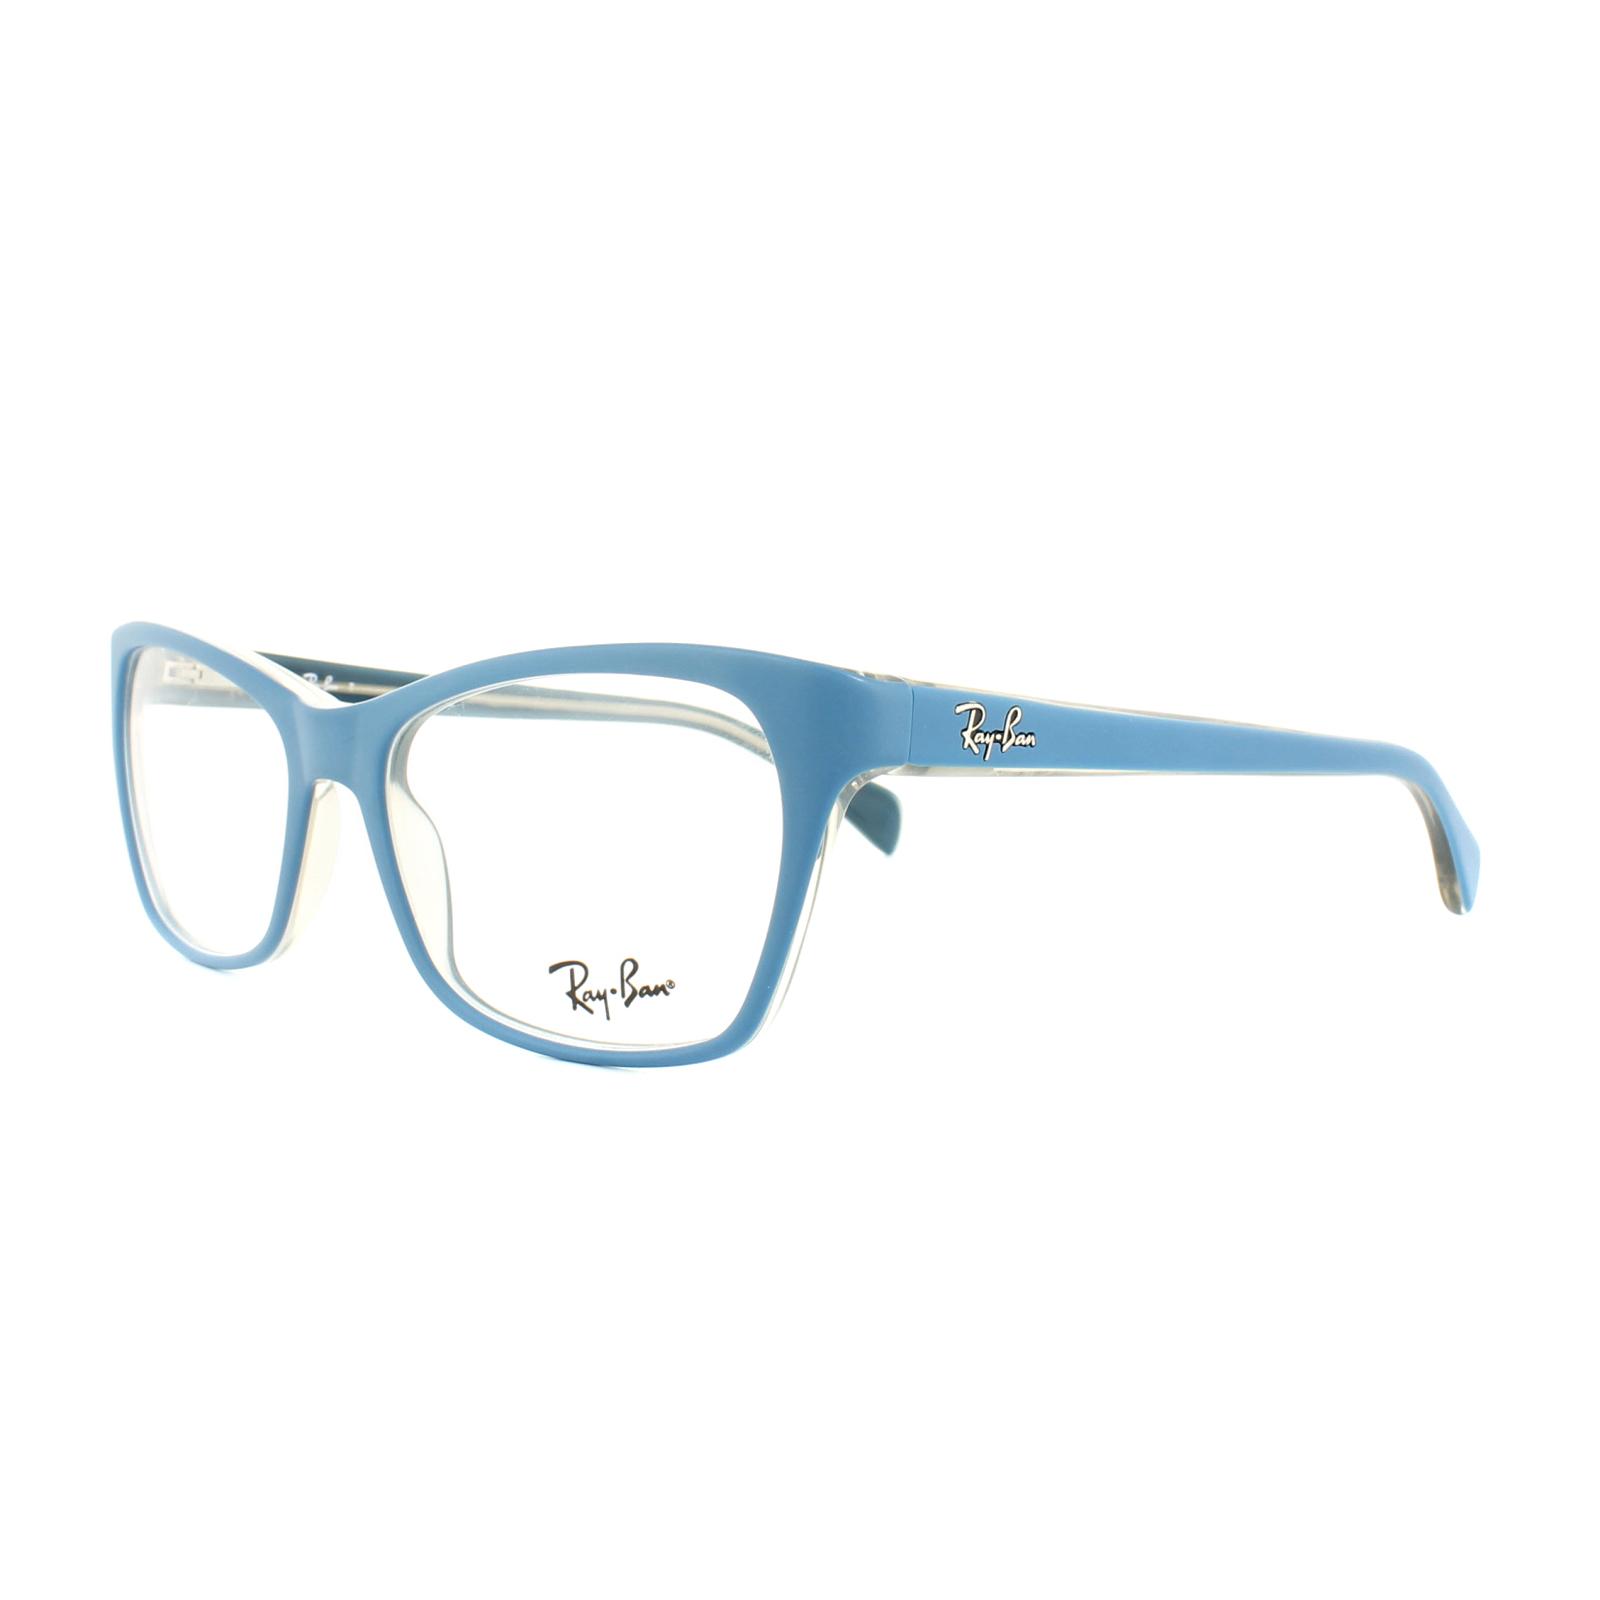 0b702858d9 Details about Ray-Ban Glasses Frames RX 5298 5391 Matt Blue on Transparent  Beige Womens 53mm